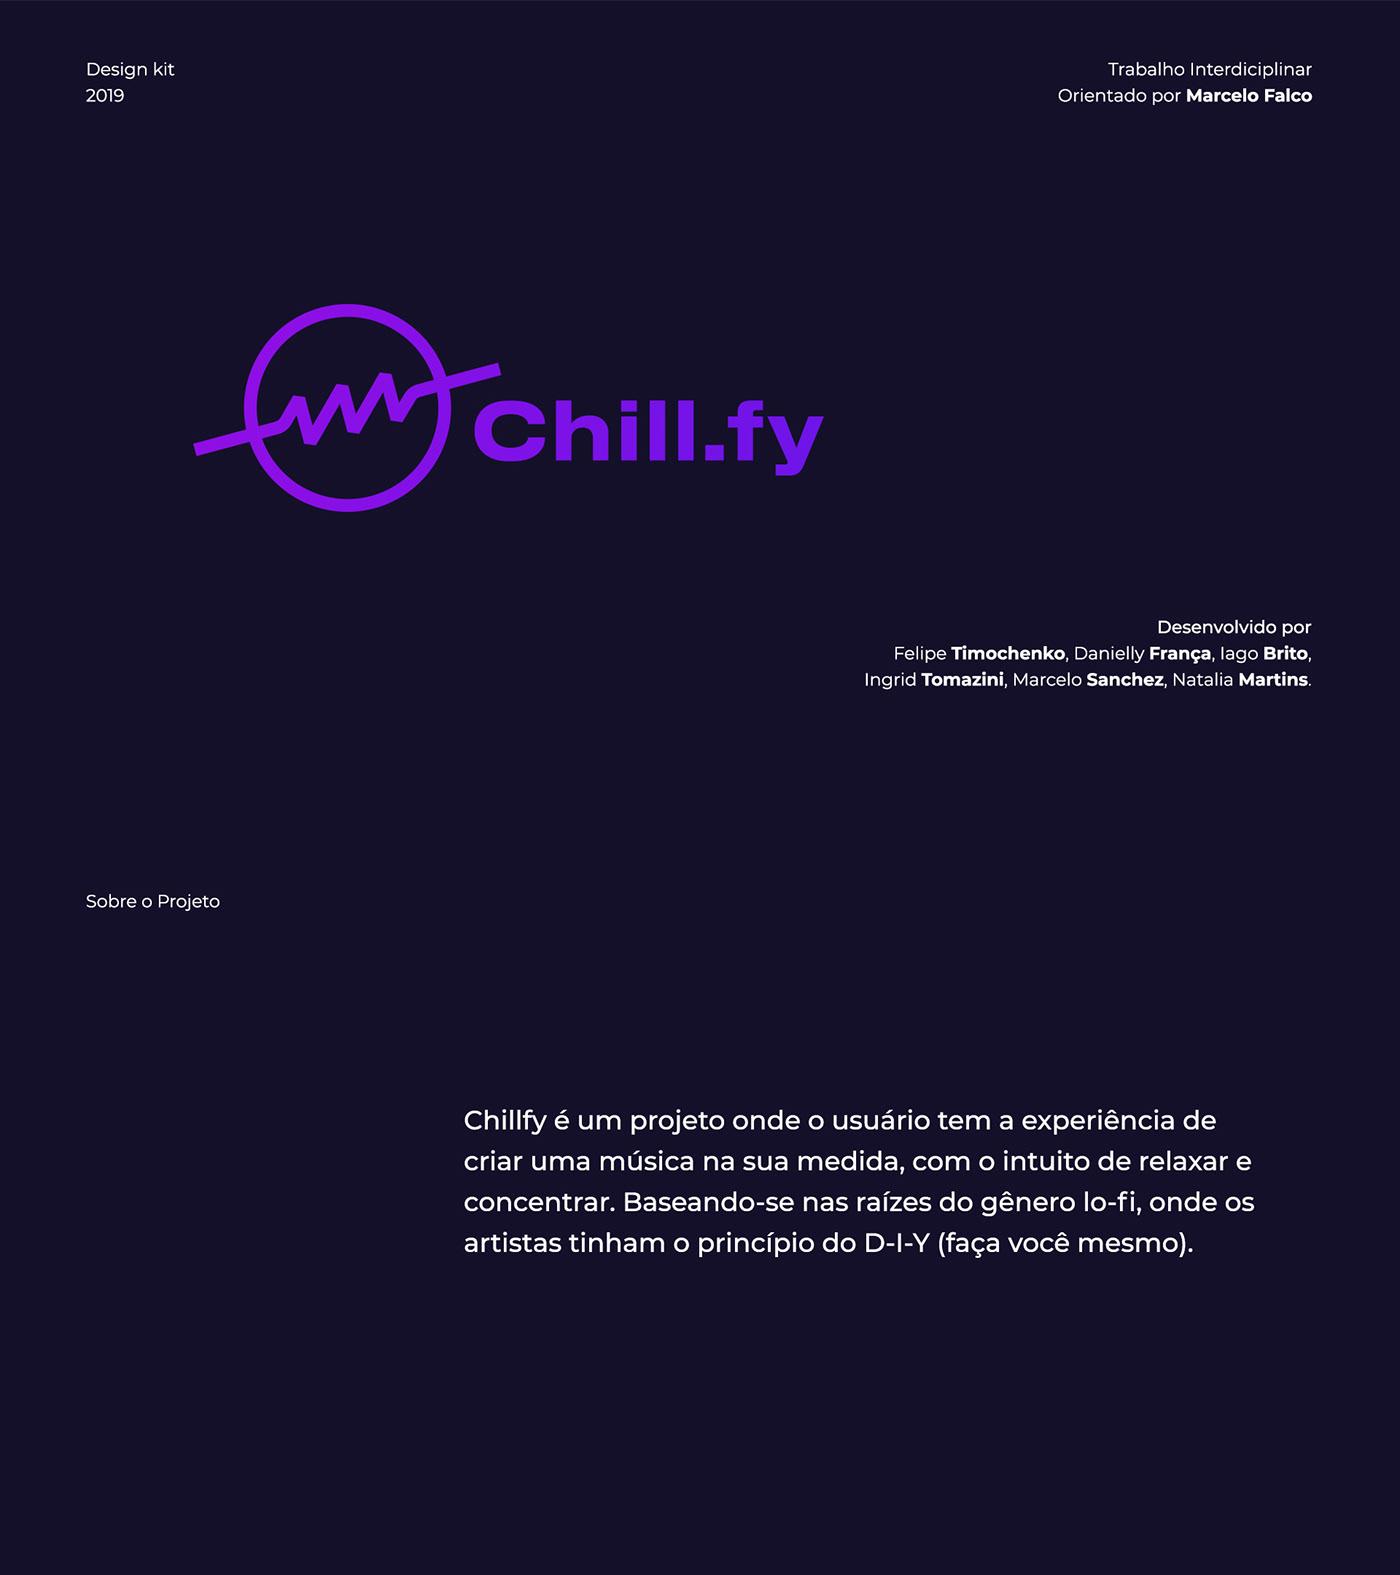 Lo-fi design digital batidas   instrumental ILLUSTRATION  ux/ui